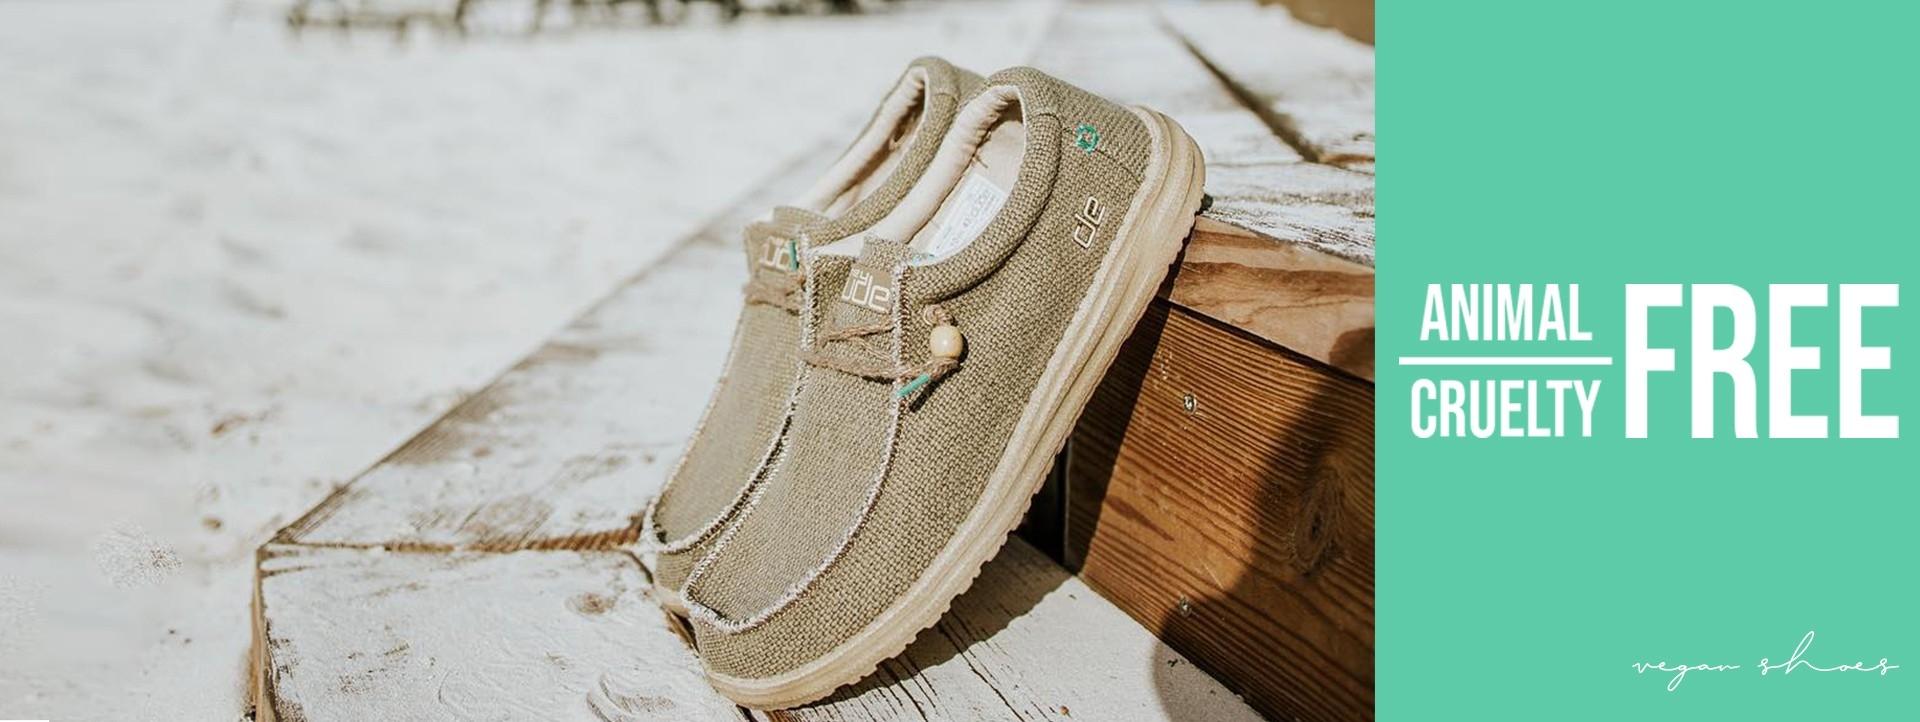 HeyDude - VeganShoes.it